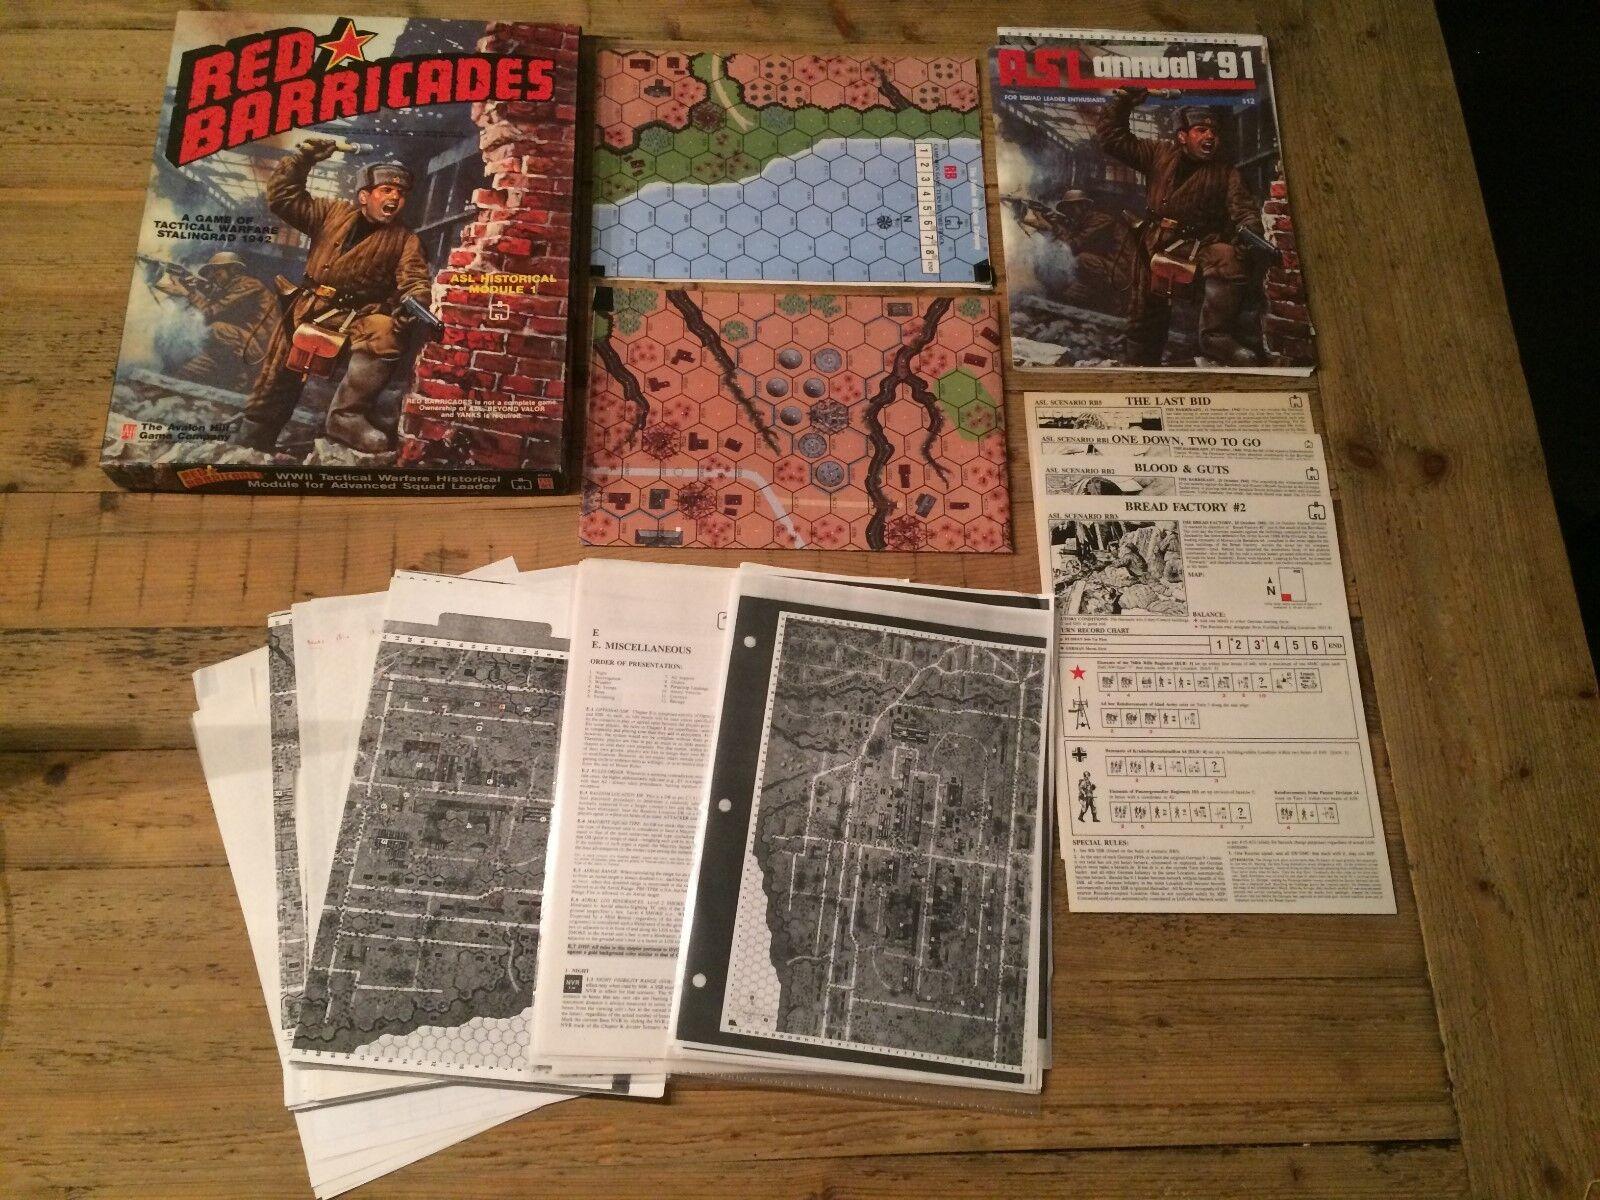 rouge Barricades (ASL) by Avalon Hill, strategy boardgame  rpg  les dernières marques en ligne